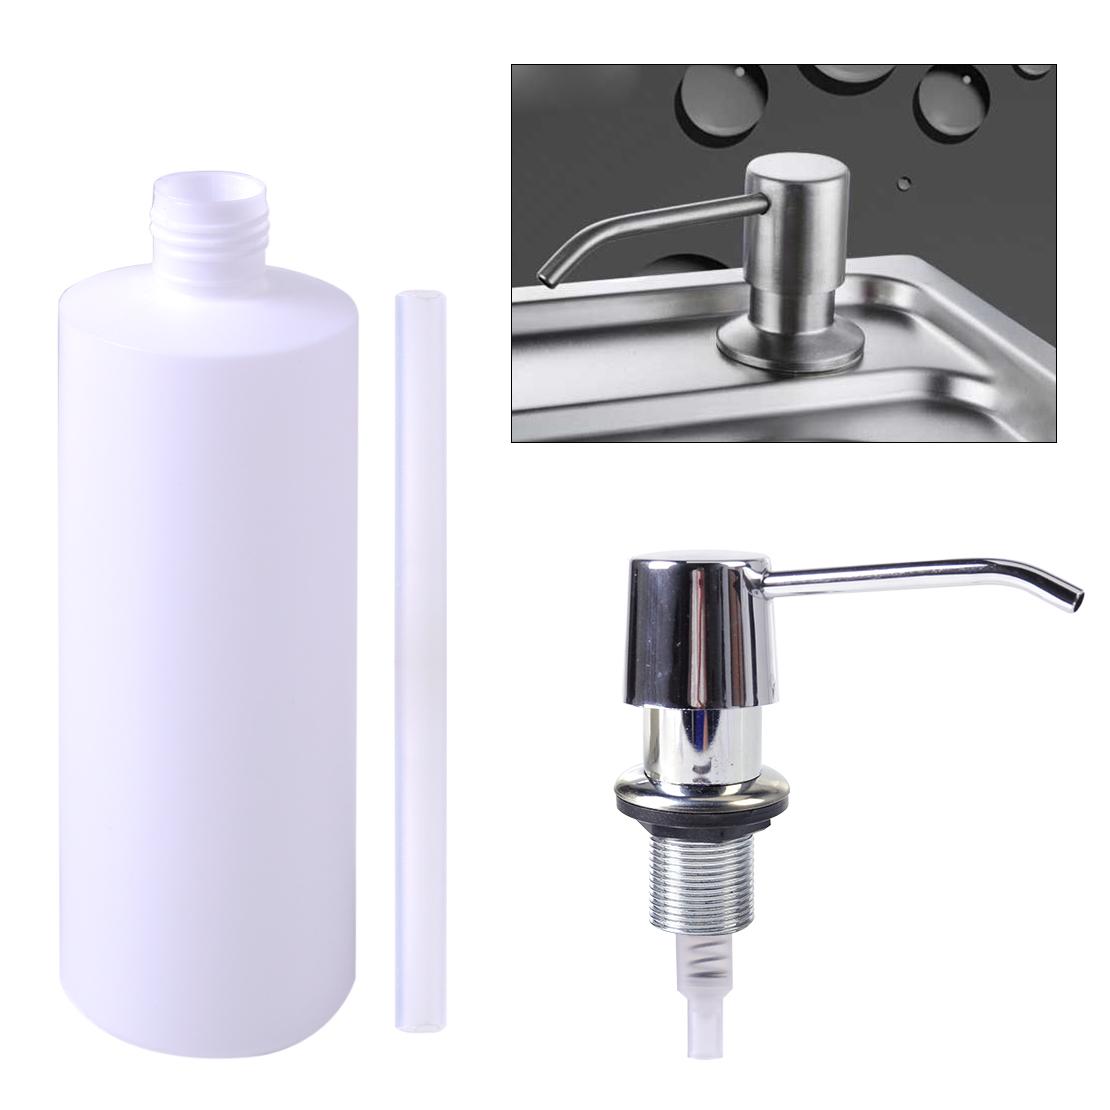 kitchen liquid dispenser knotty alder cabinets bathroom sink soap holder plastic